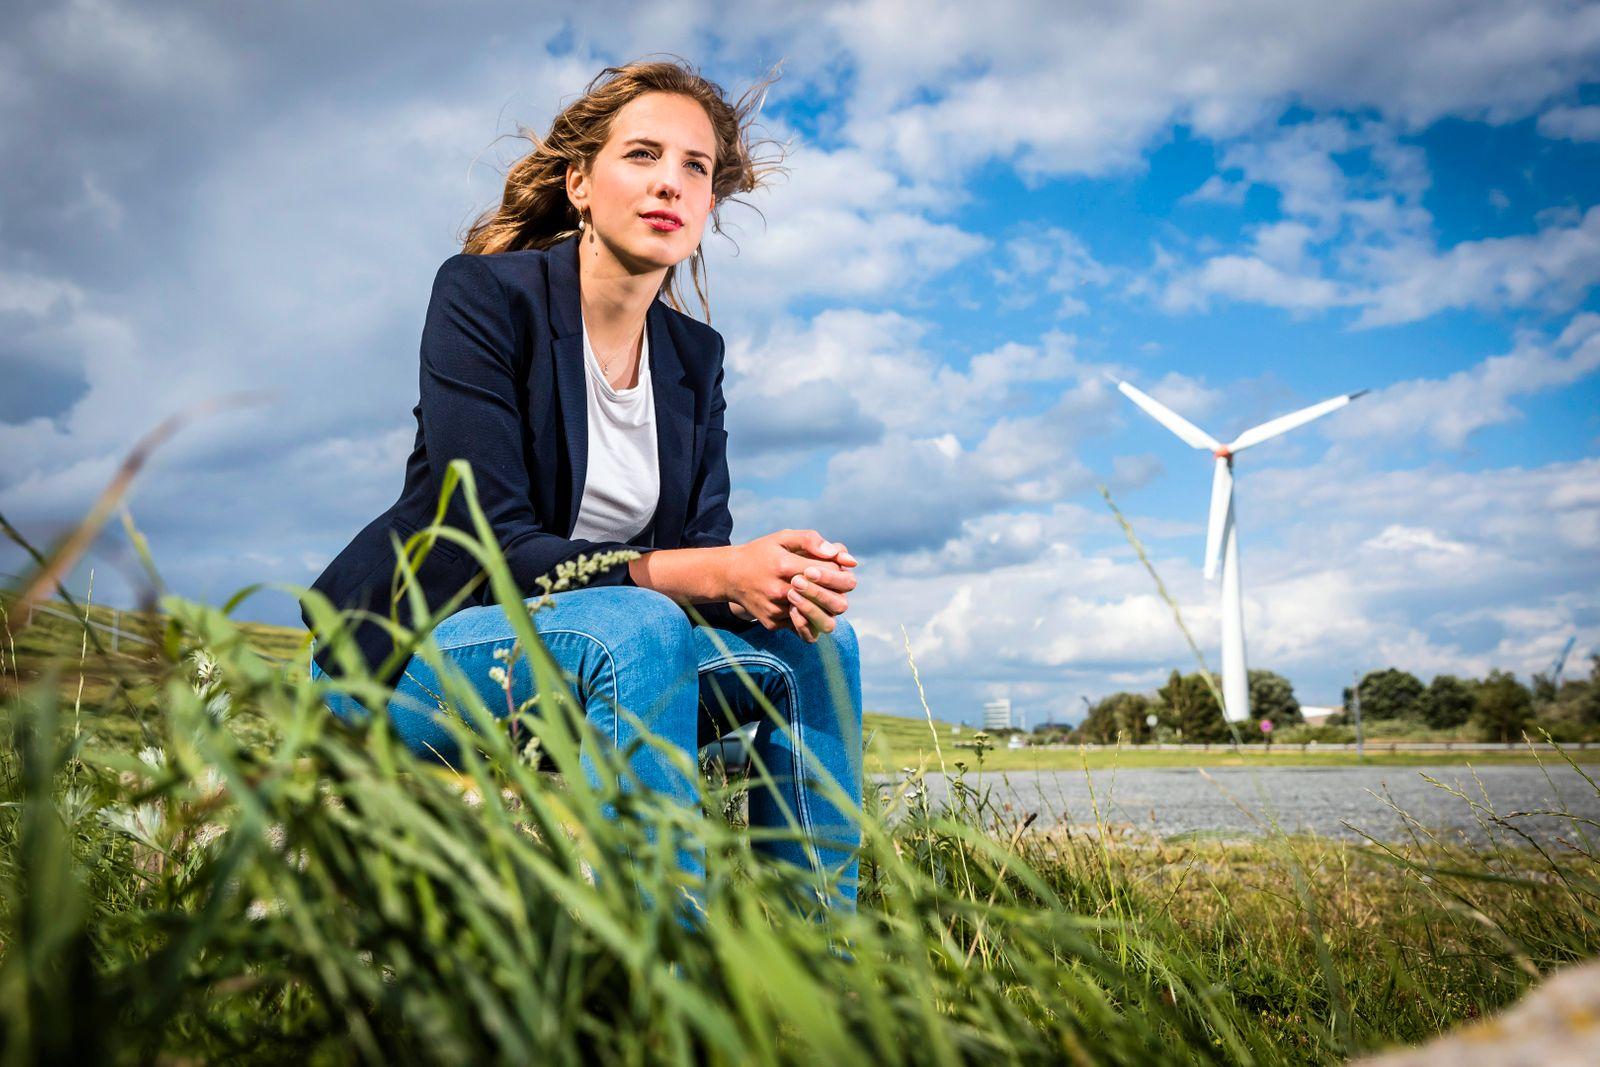 Bremen / 29.07.2021 - Portrait / Reportage: Wiebke Winter (CDU).